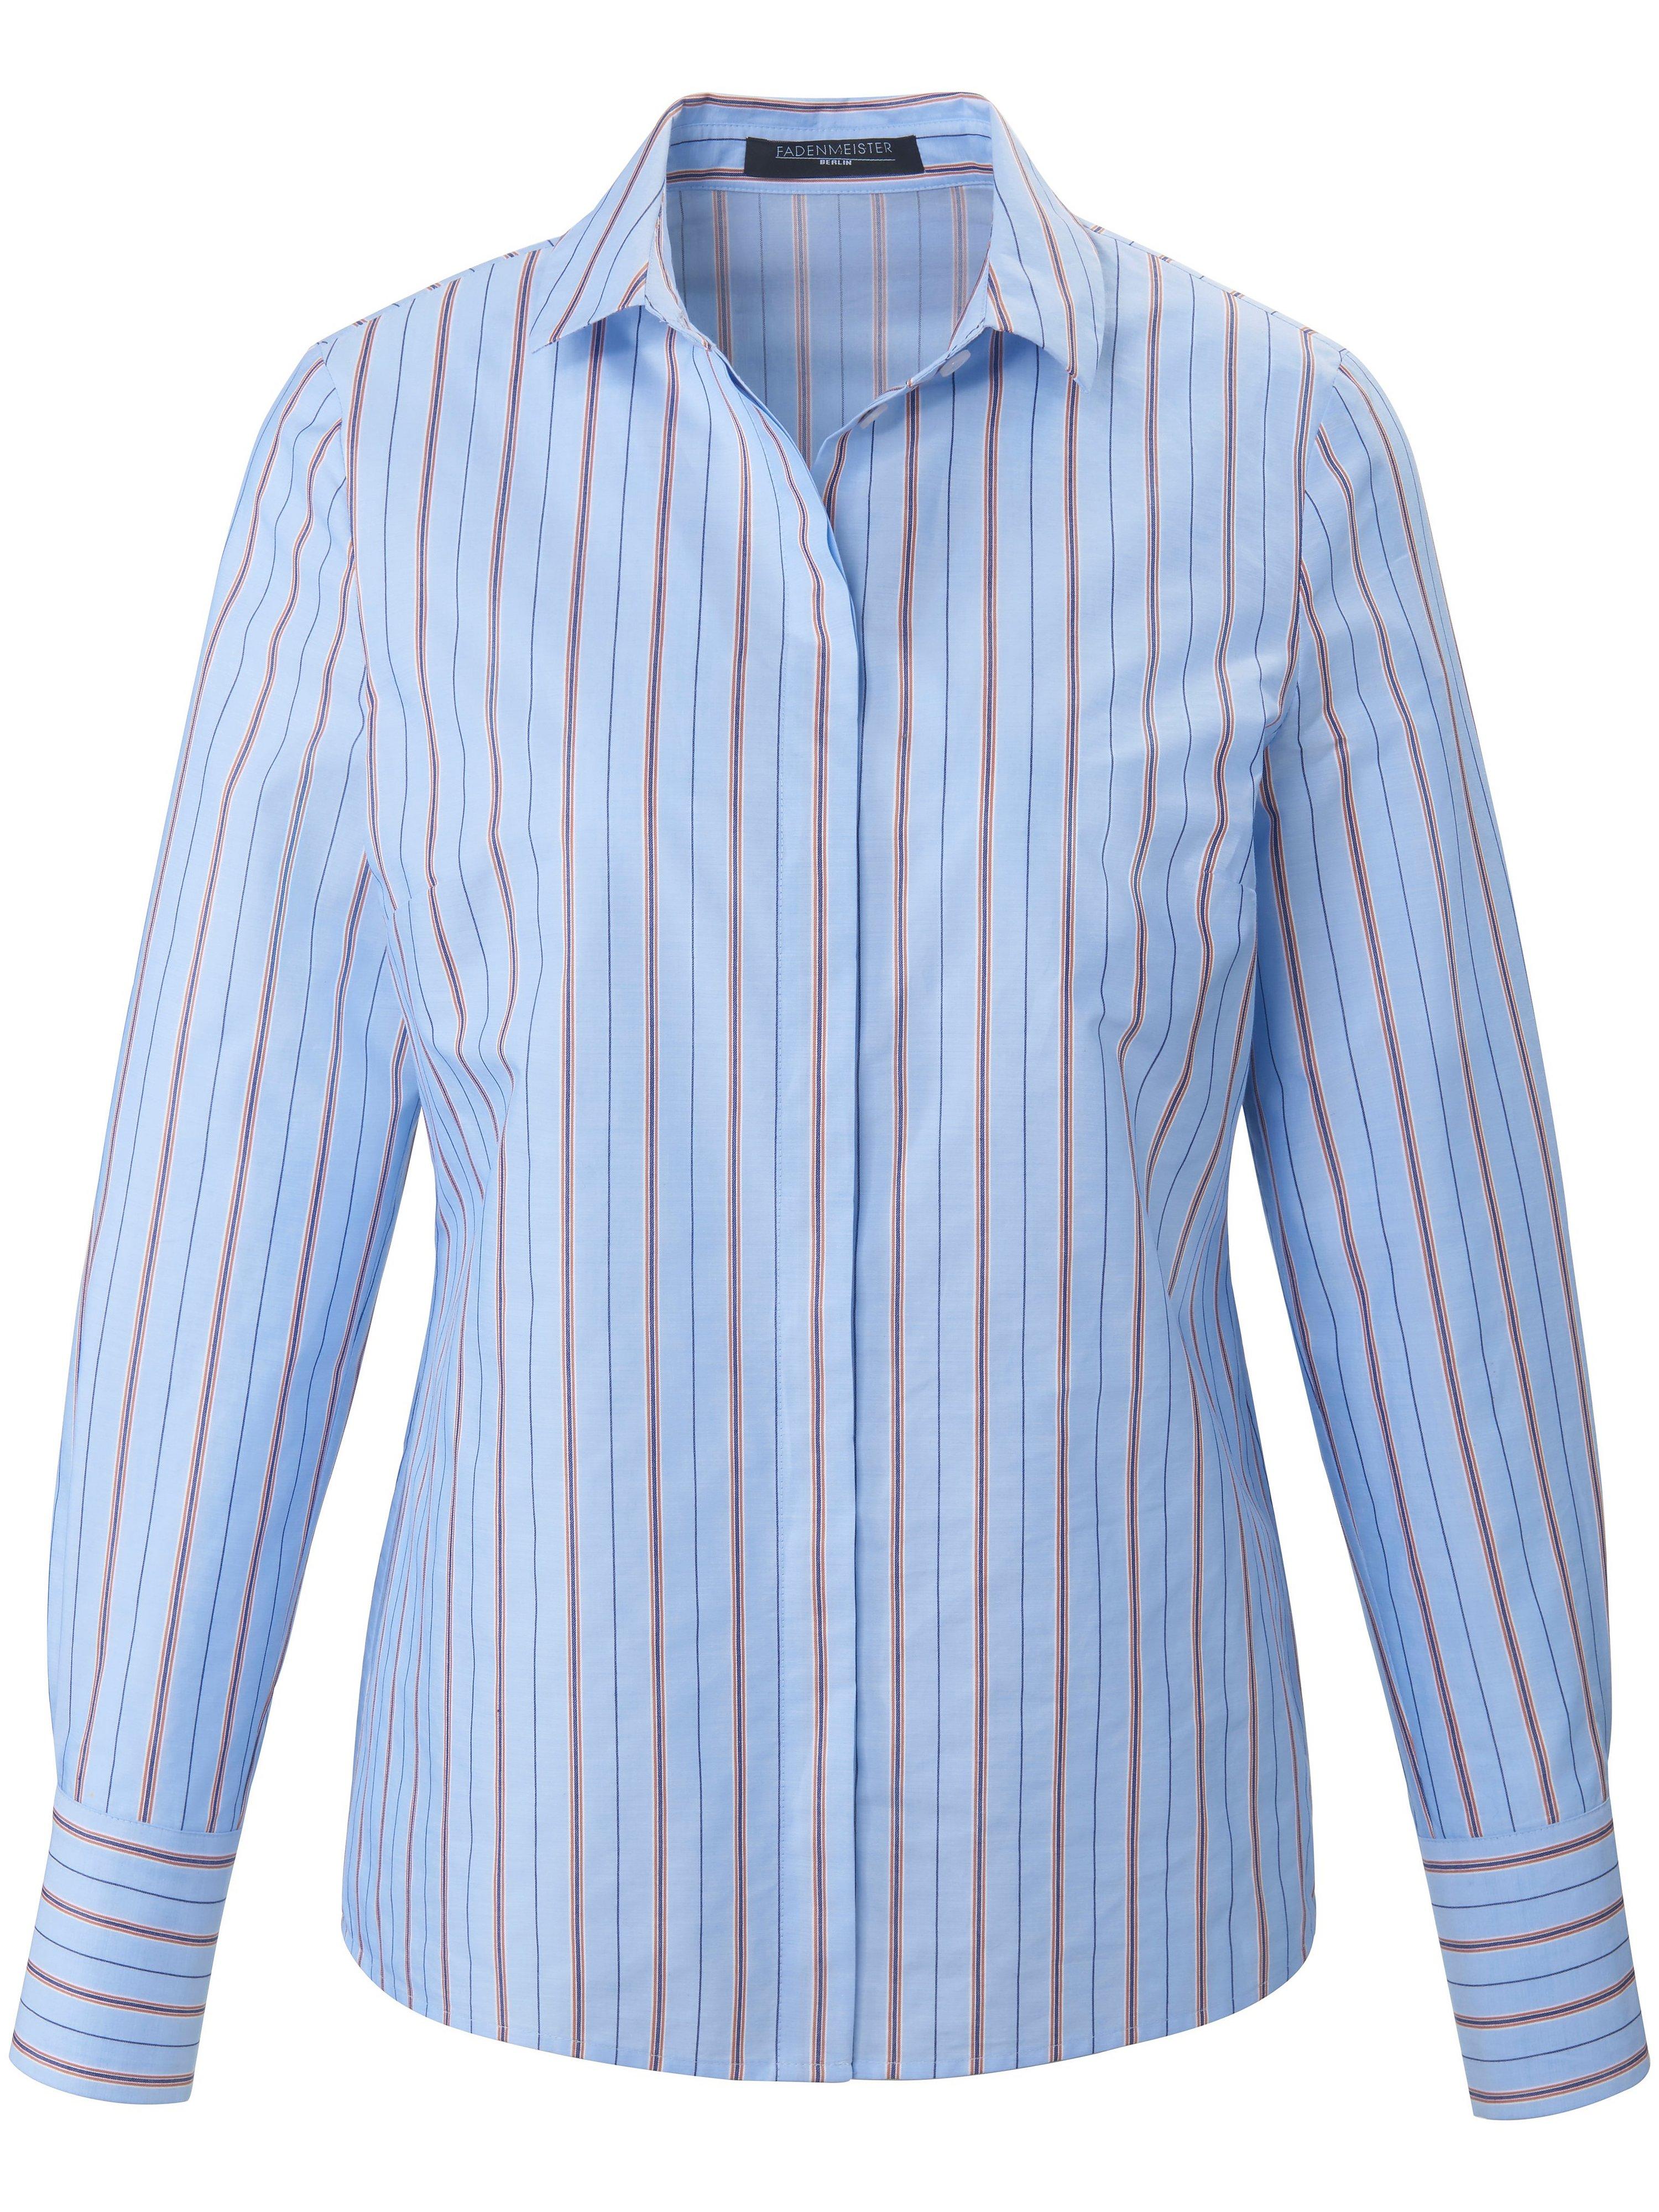 Blouse long sleeves Fadenmeister Berlin blue